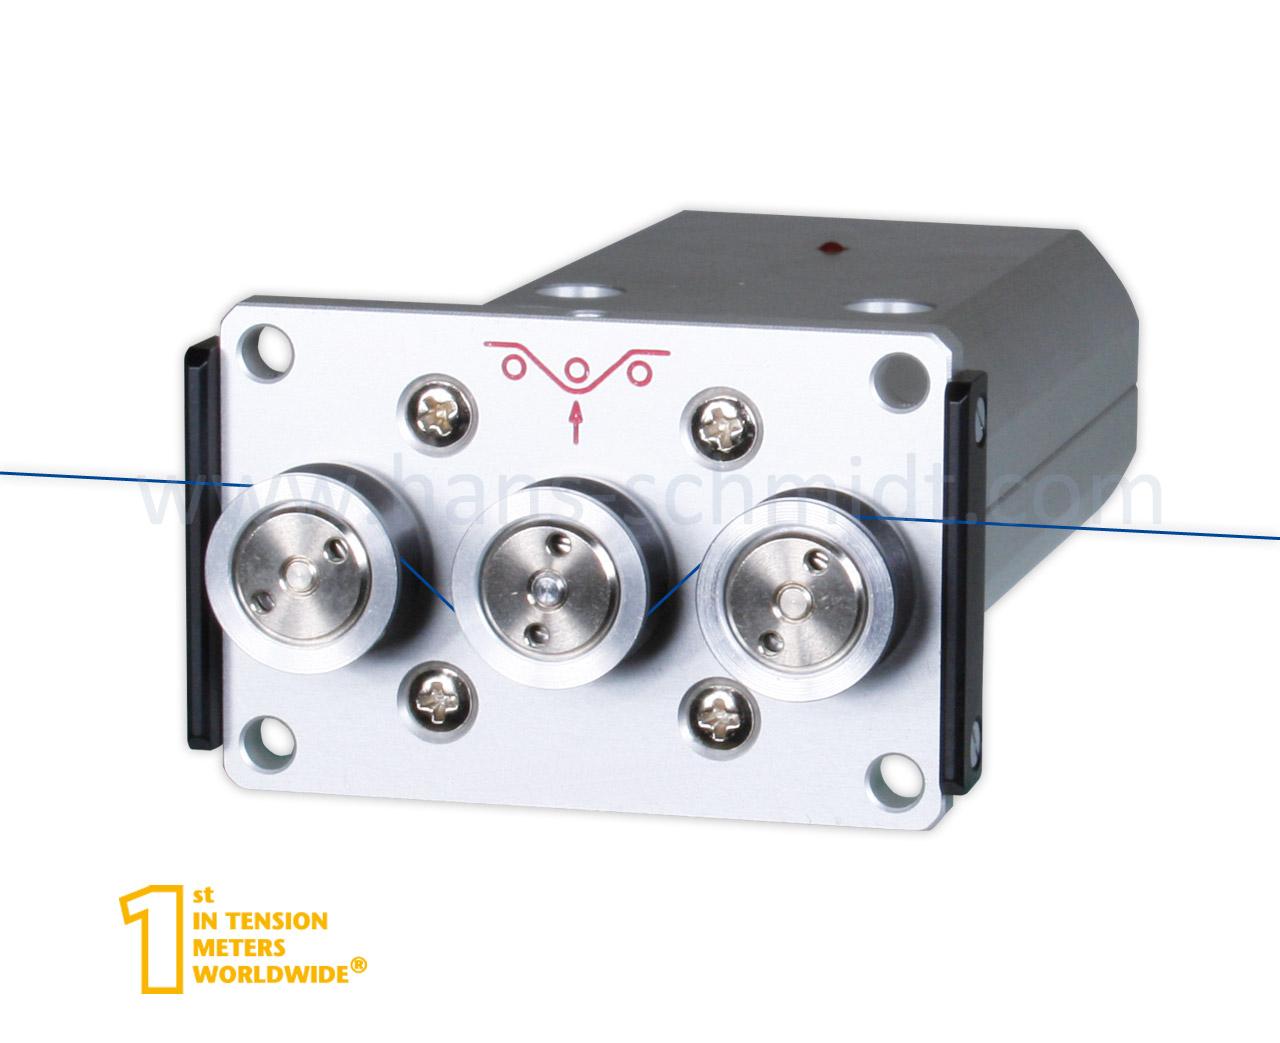 Zugspannungssensor FS1-422, Mehrplatzsystem - Hans Schmidt